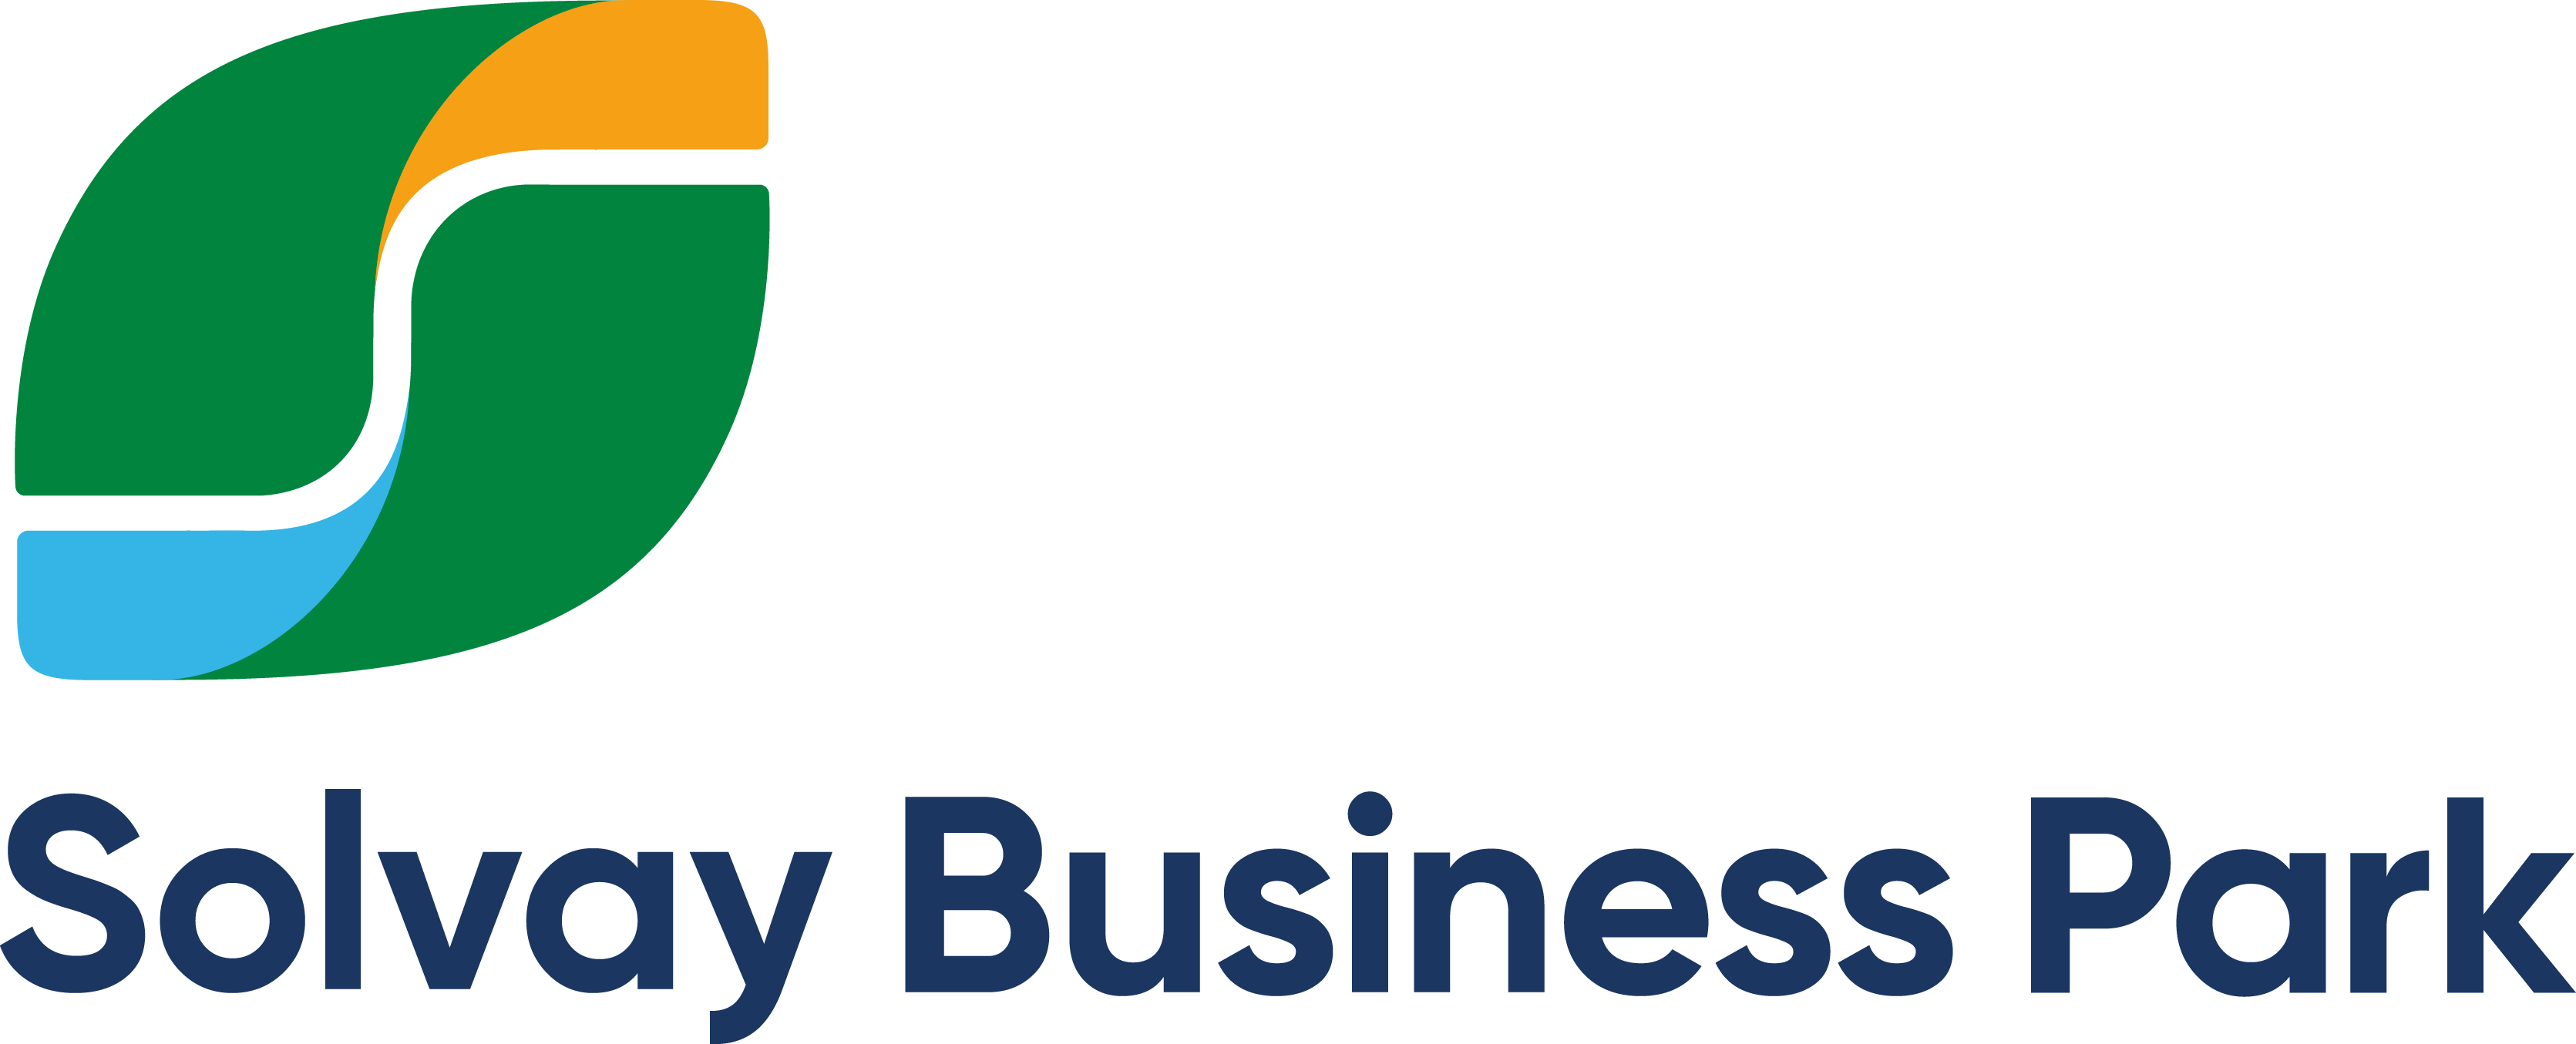 Solvay Buisness Park logo